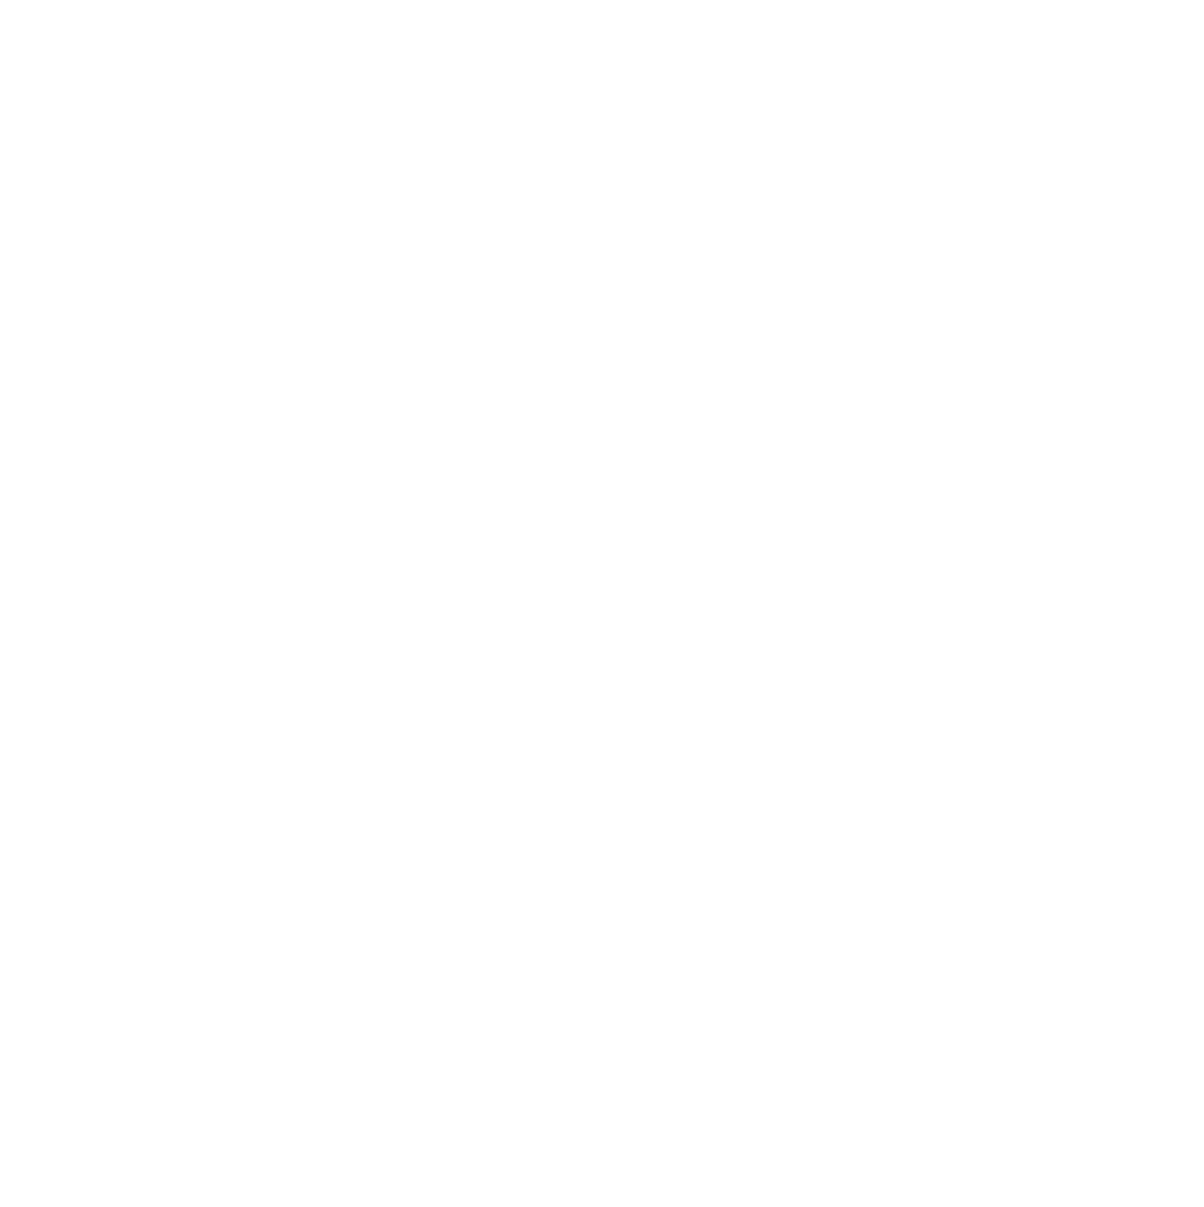 cardif-01